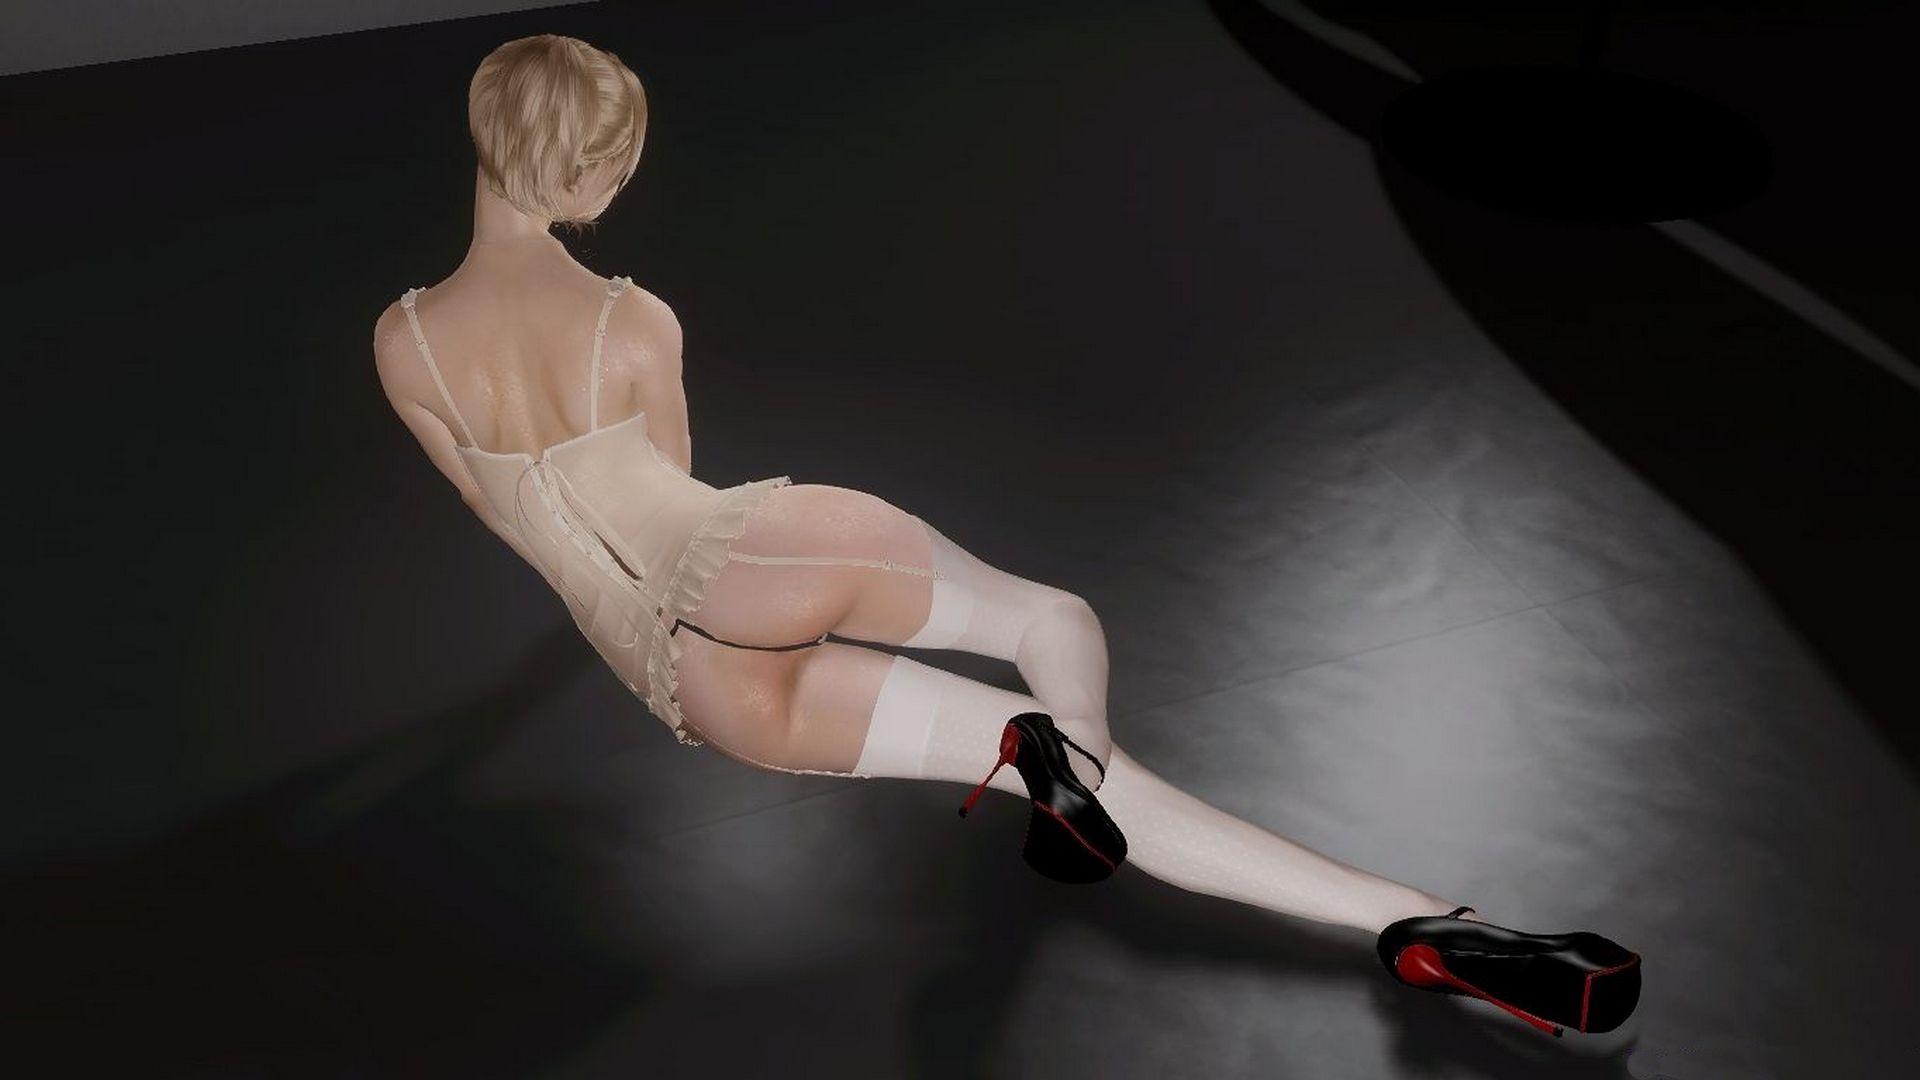 Autumn heels and stockings 02.jpg